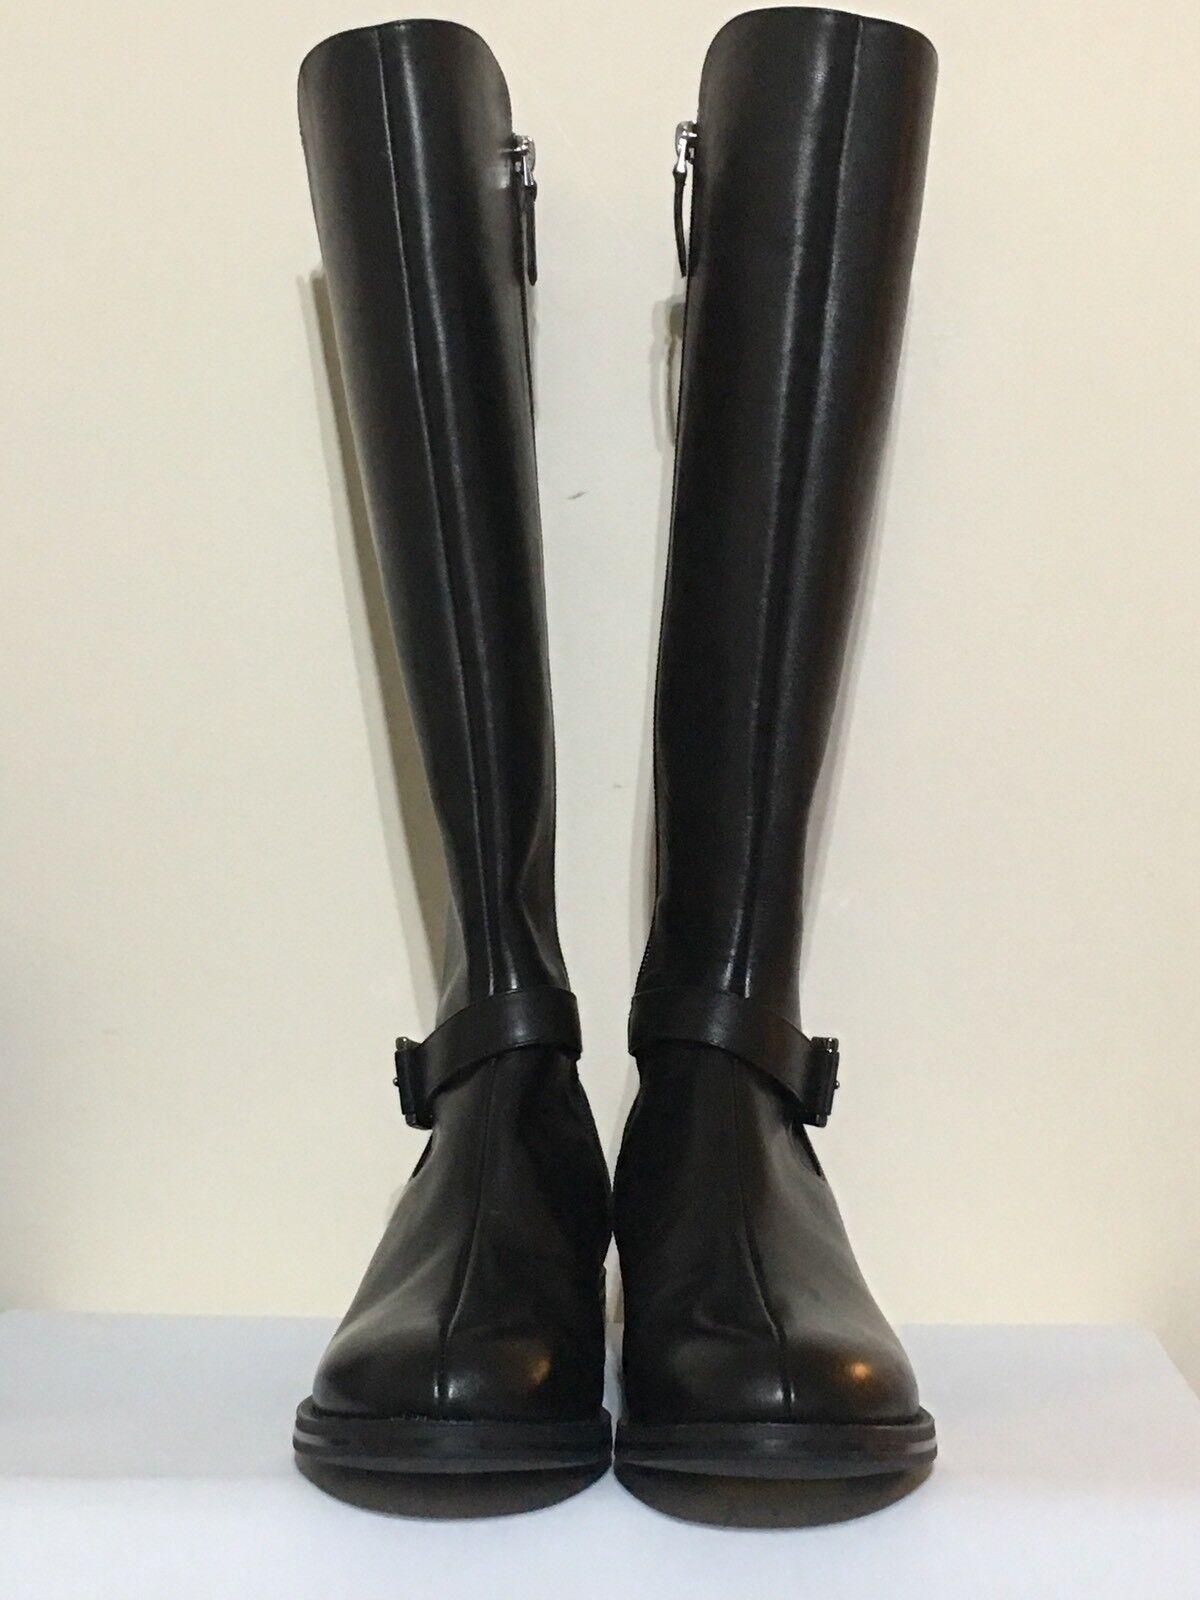 Emporio Armani X30117 Flat Knee High Black Boots UK Size 3, Eu 36, US 5.5